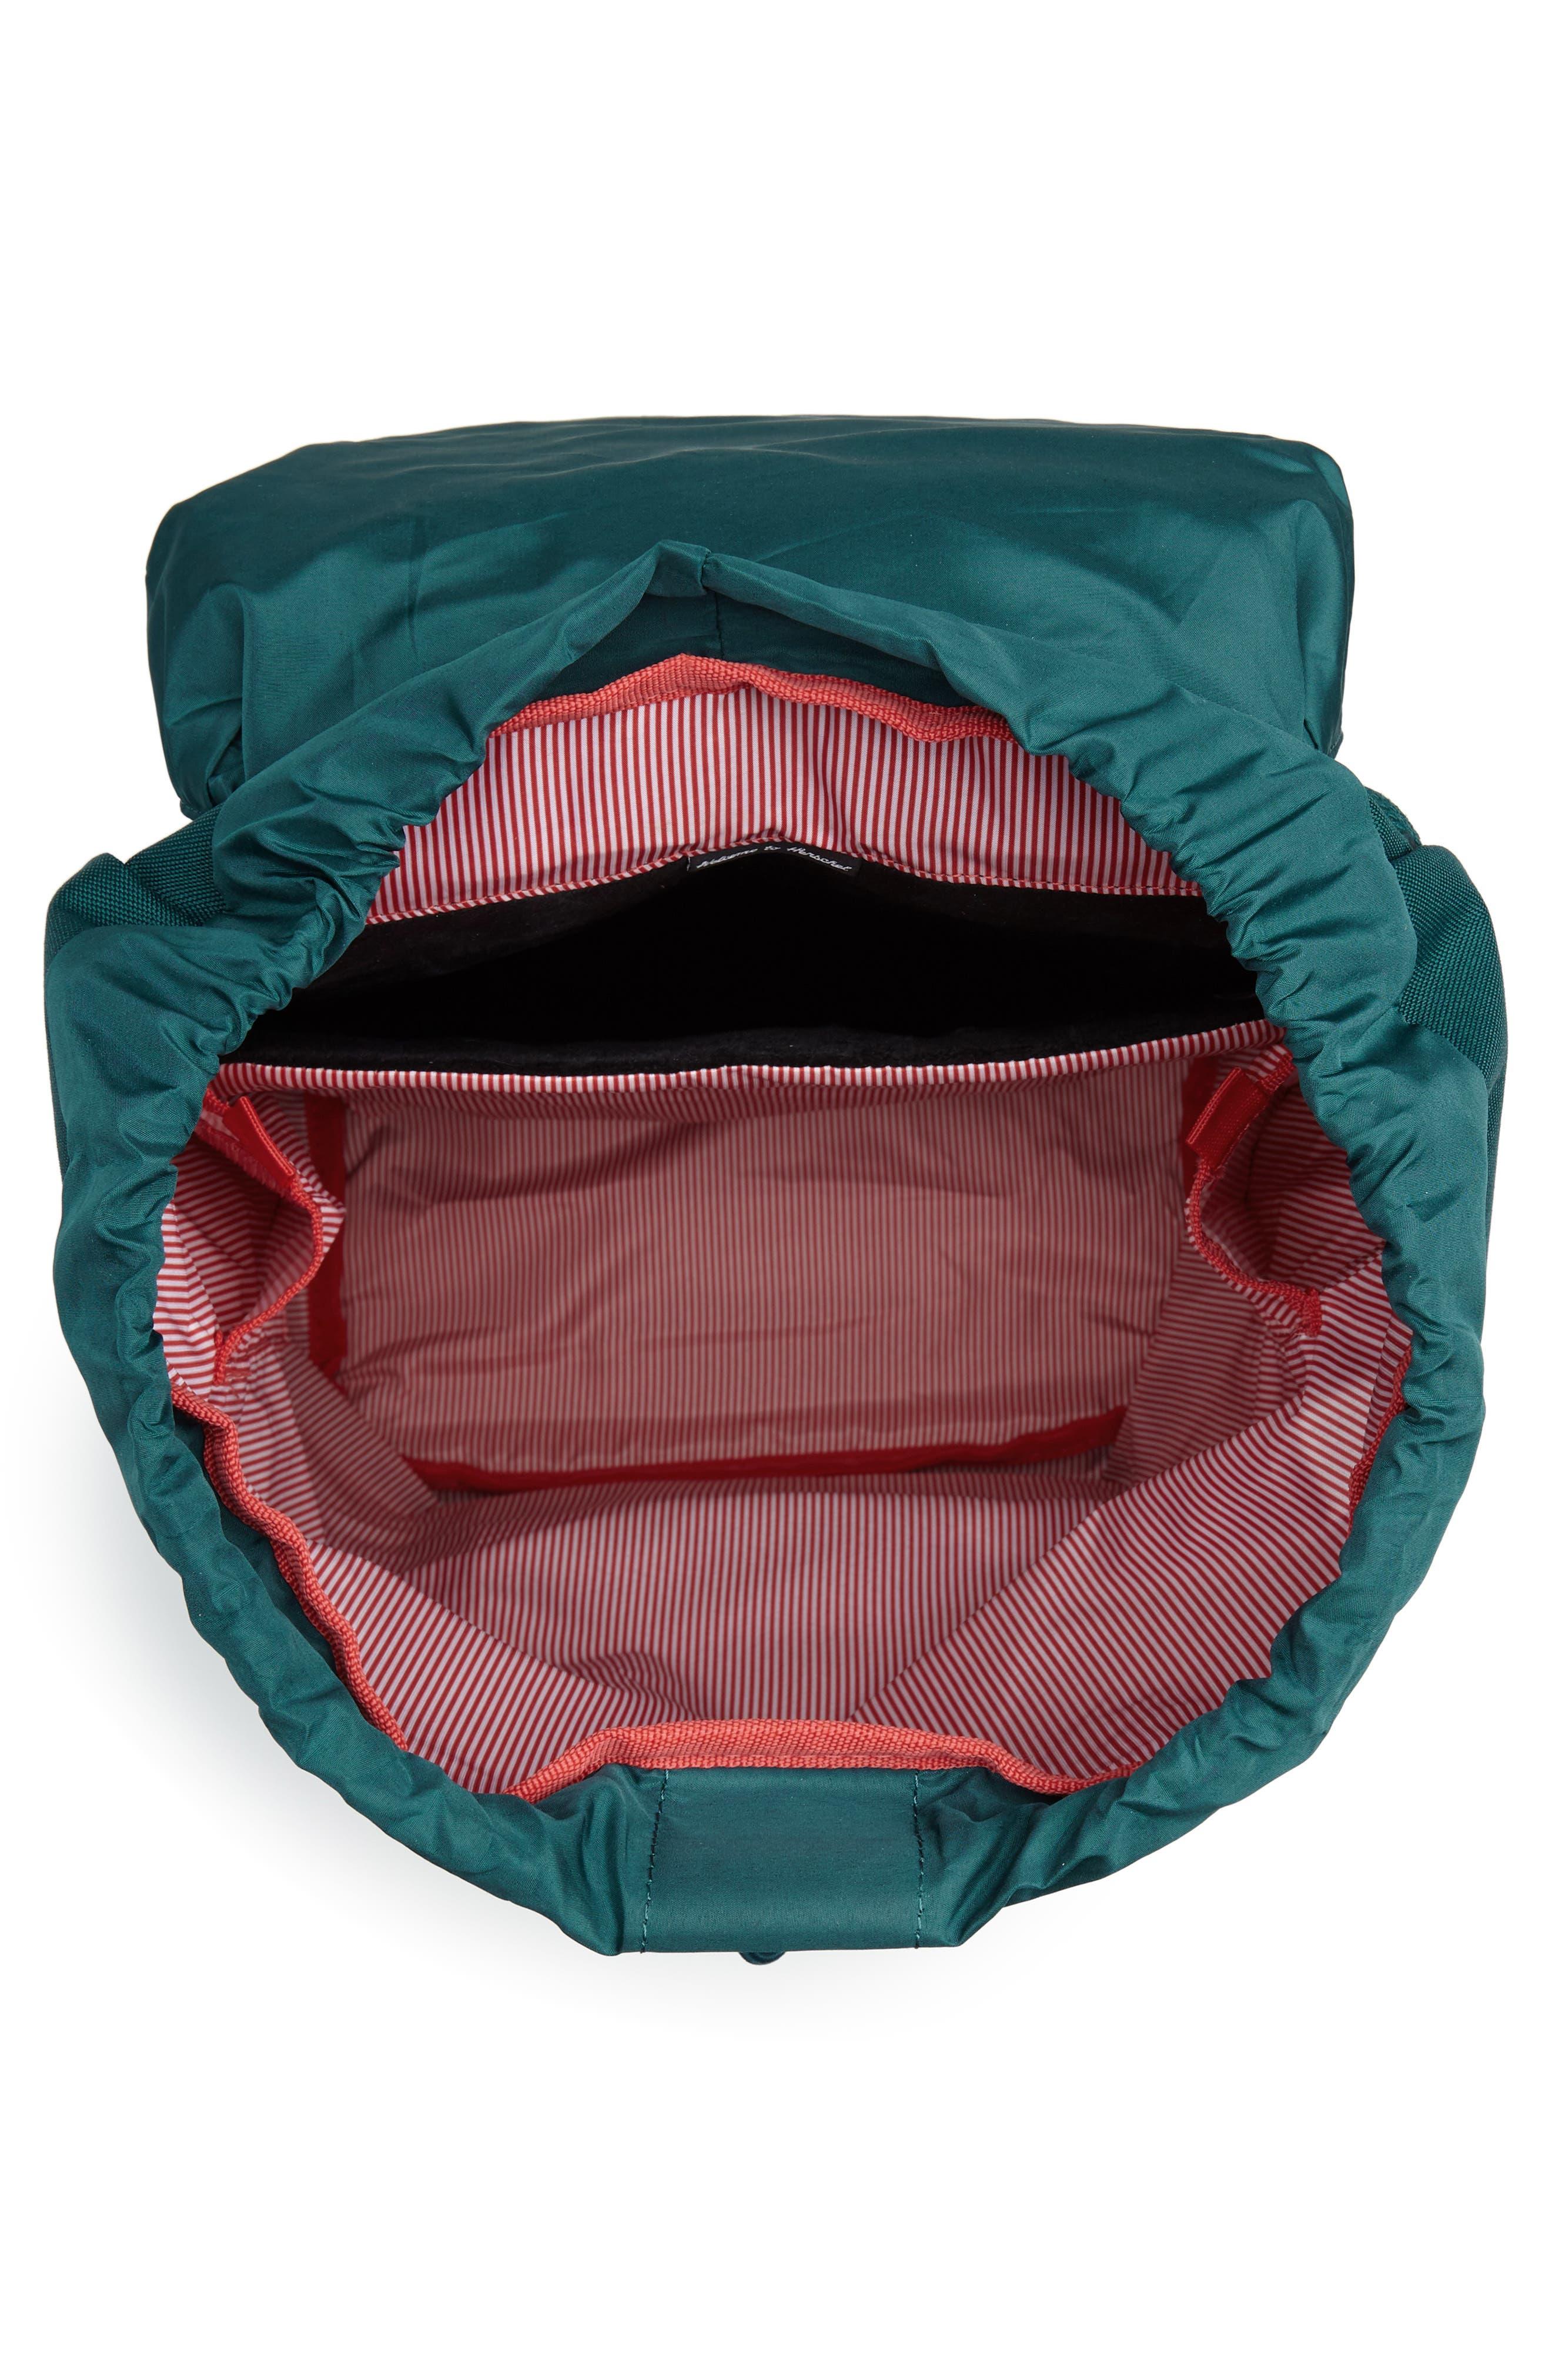 Little America Backpack,                             Alternate thumbnail 4, color,                             DEEP TEAL/ TAN